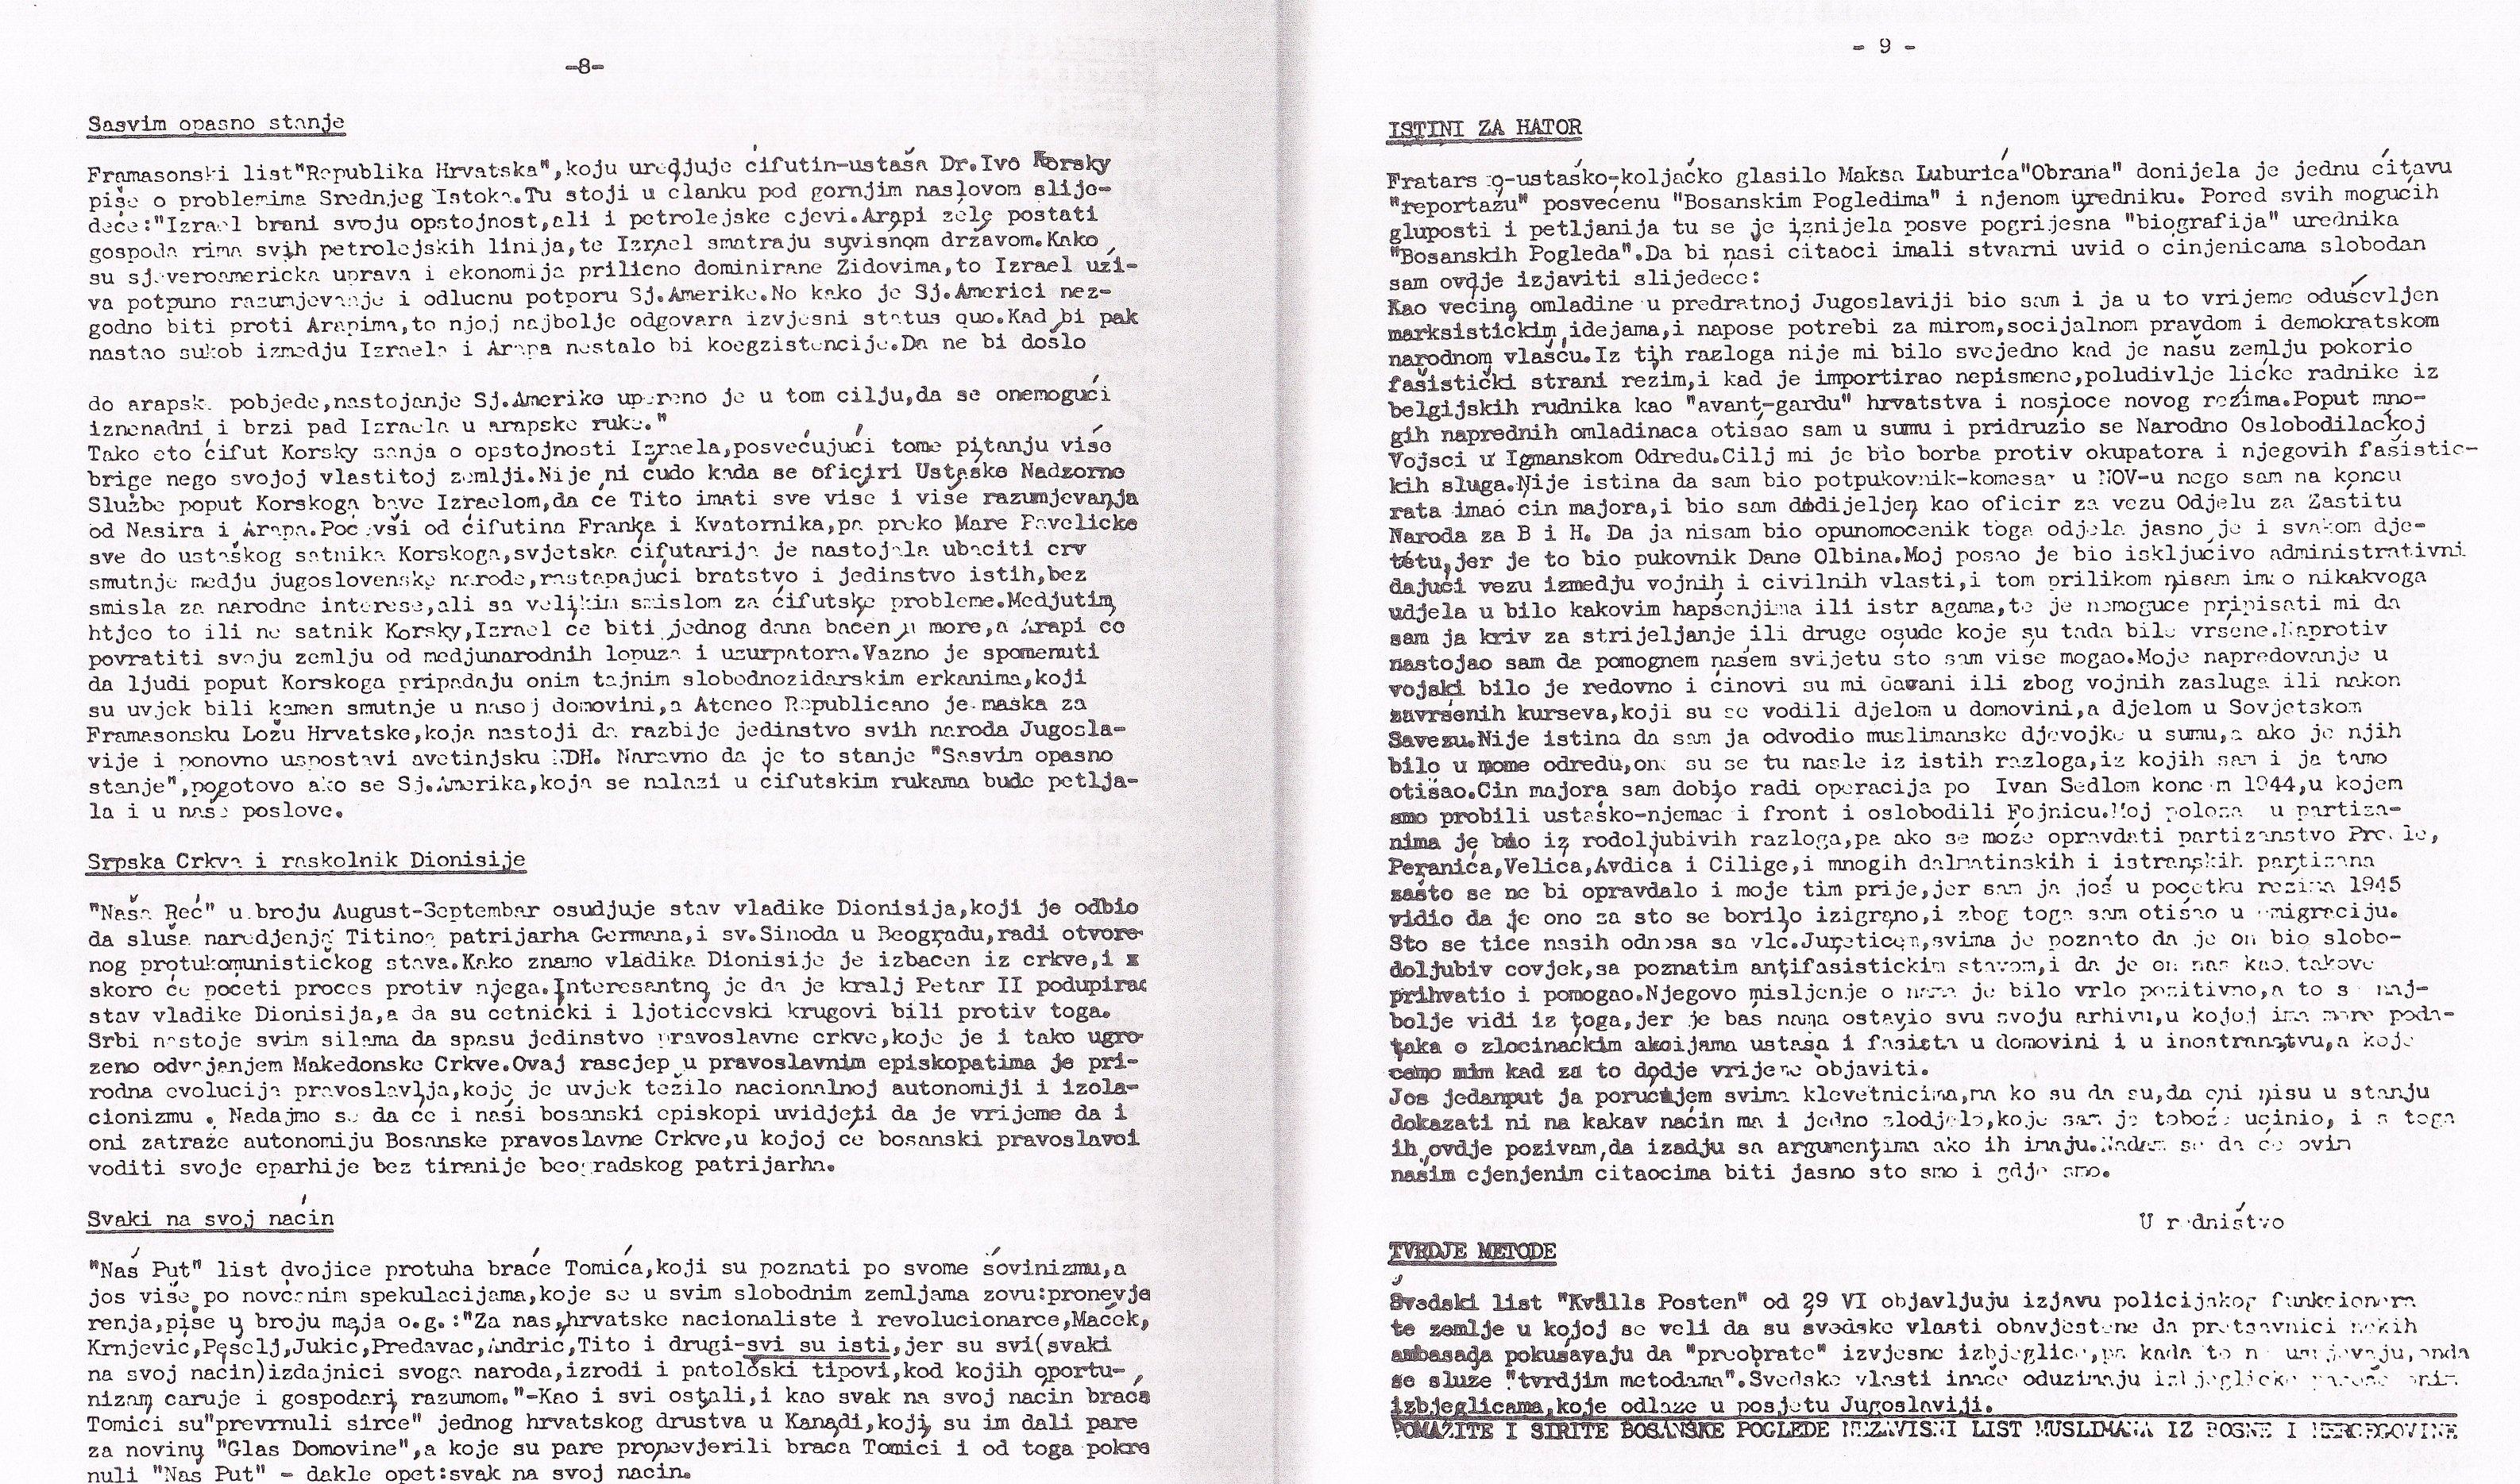 Bosanski pogledi Falsificat